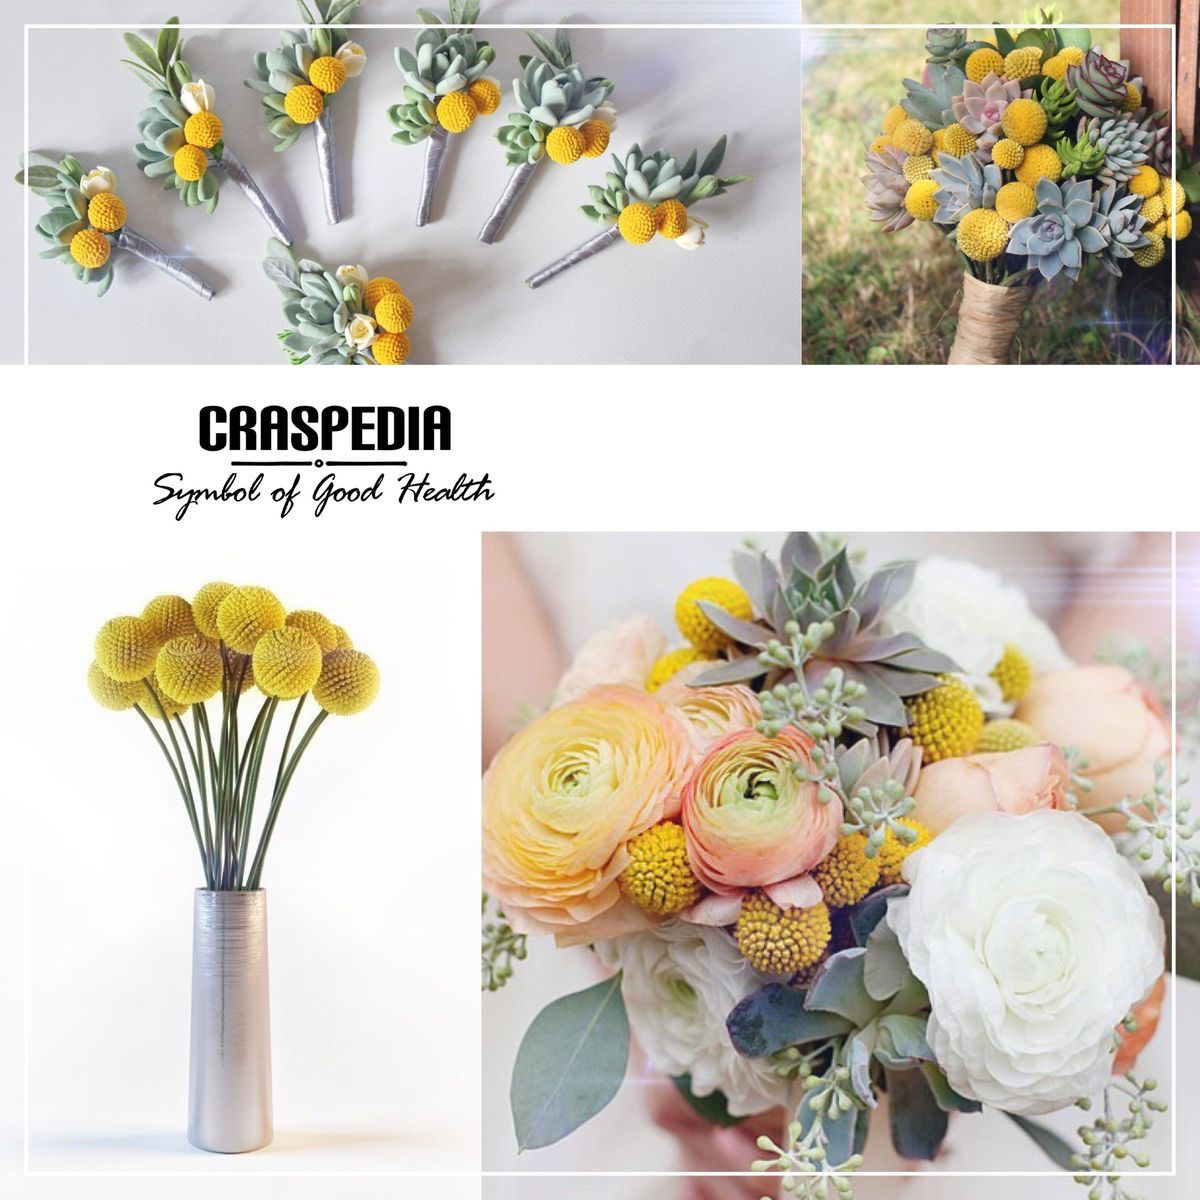 Craspedia Flower Meanings Craspedia Flowers